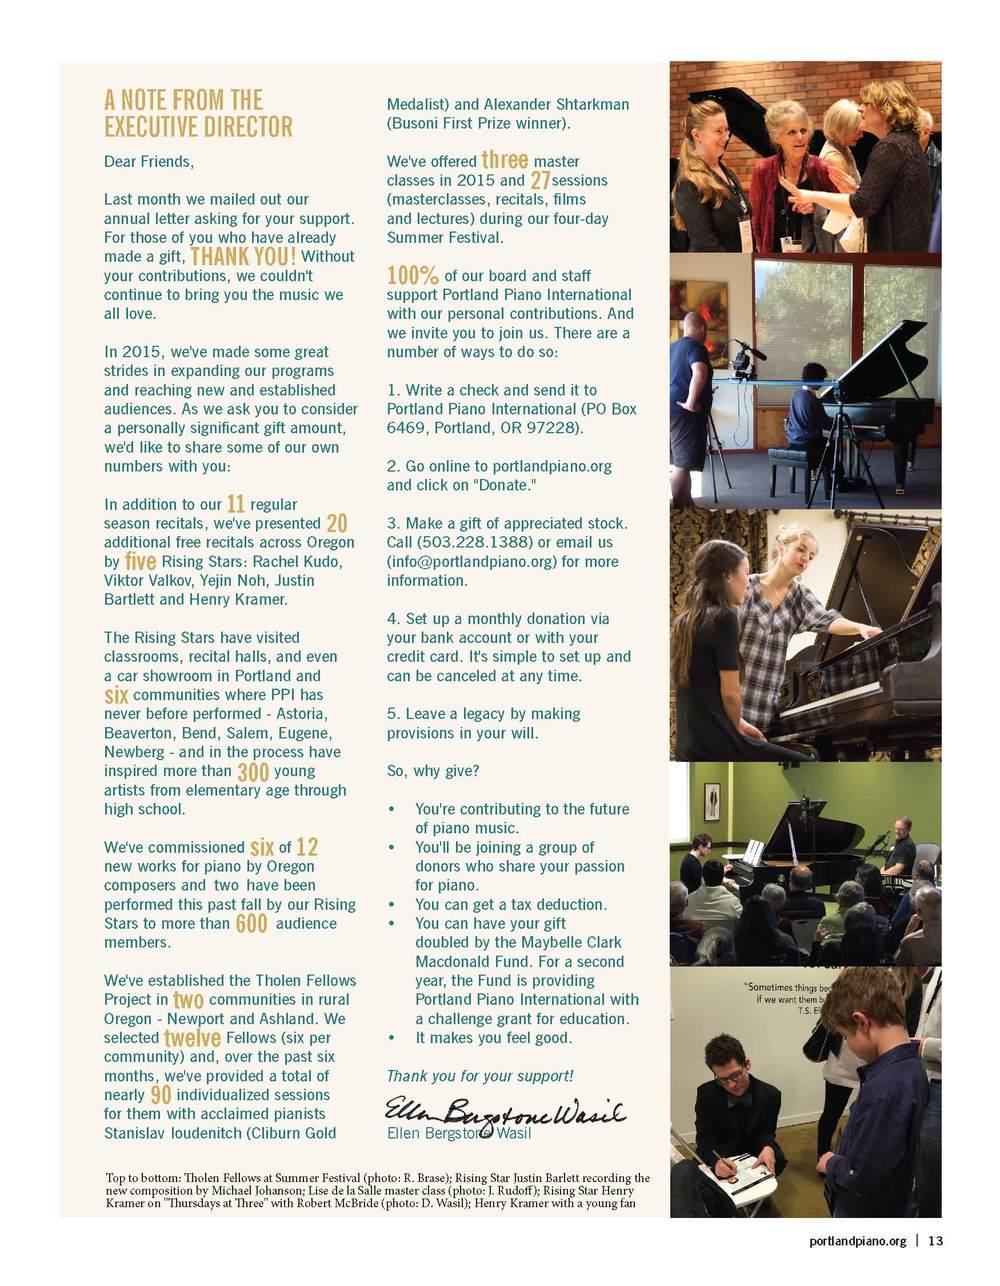 PPI_Program_Albright FINAL_Page_15.jpg